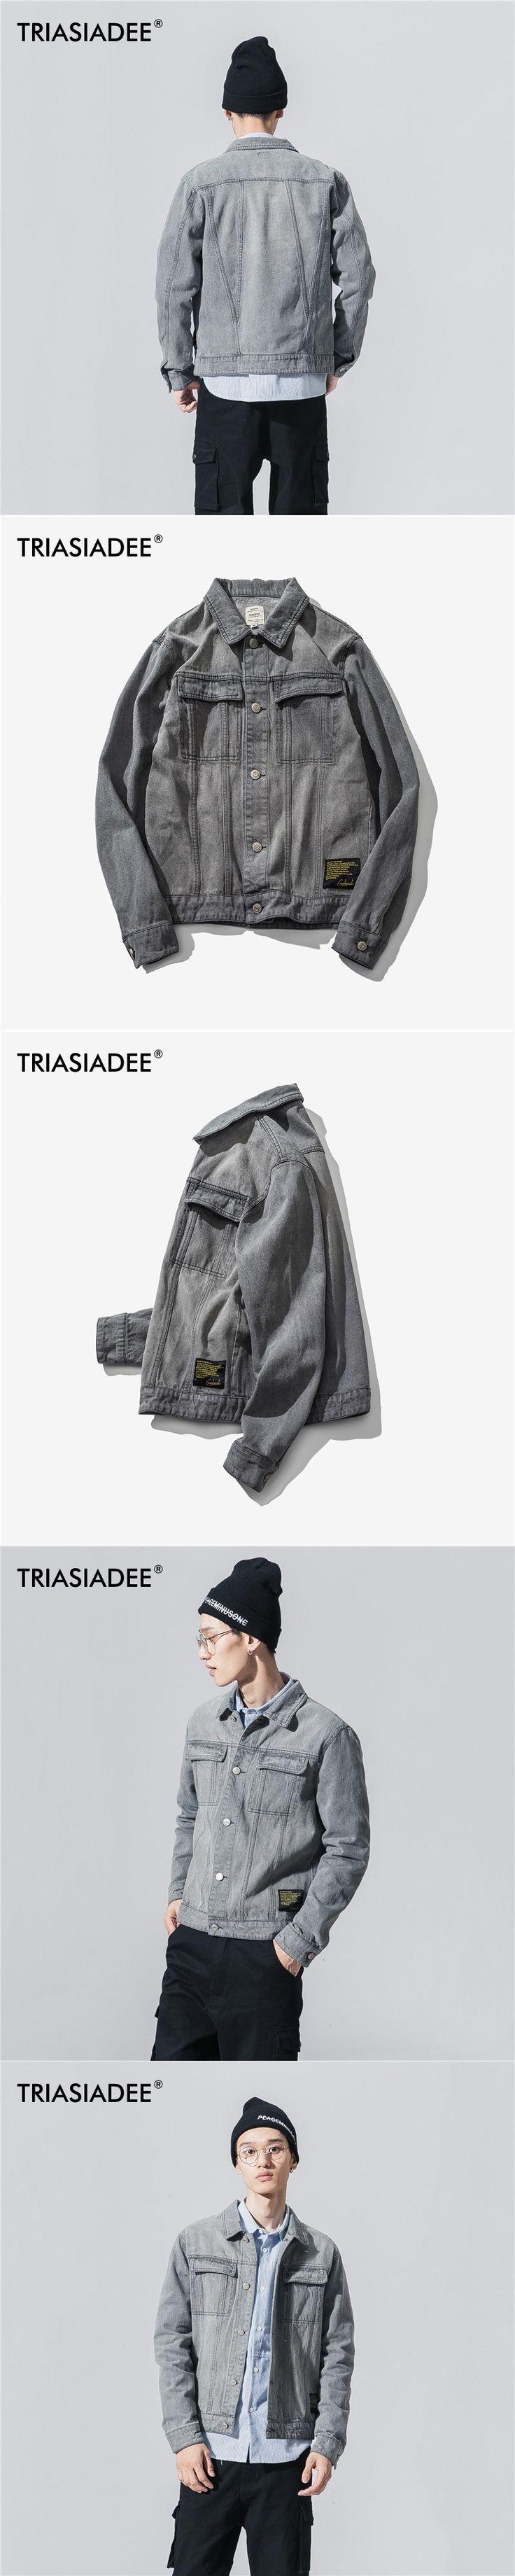 TRIASIADEE Denim Jacket Men Jaquetas Masculina Inverno Chaqueta Hombre Jean Jacket